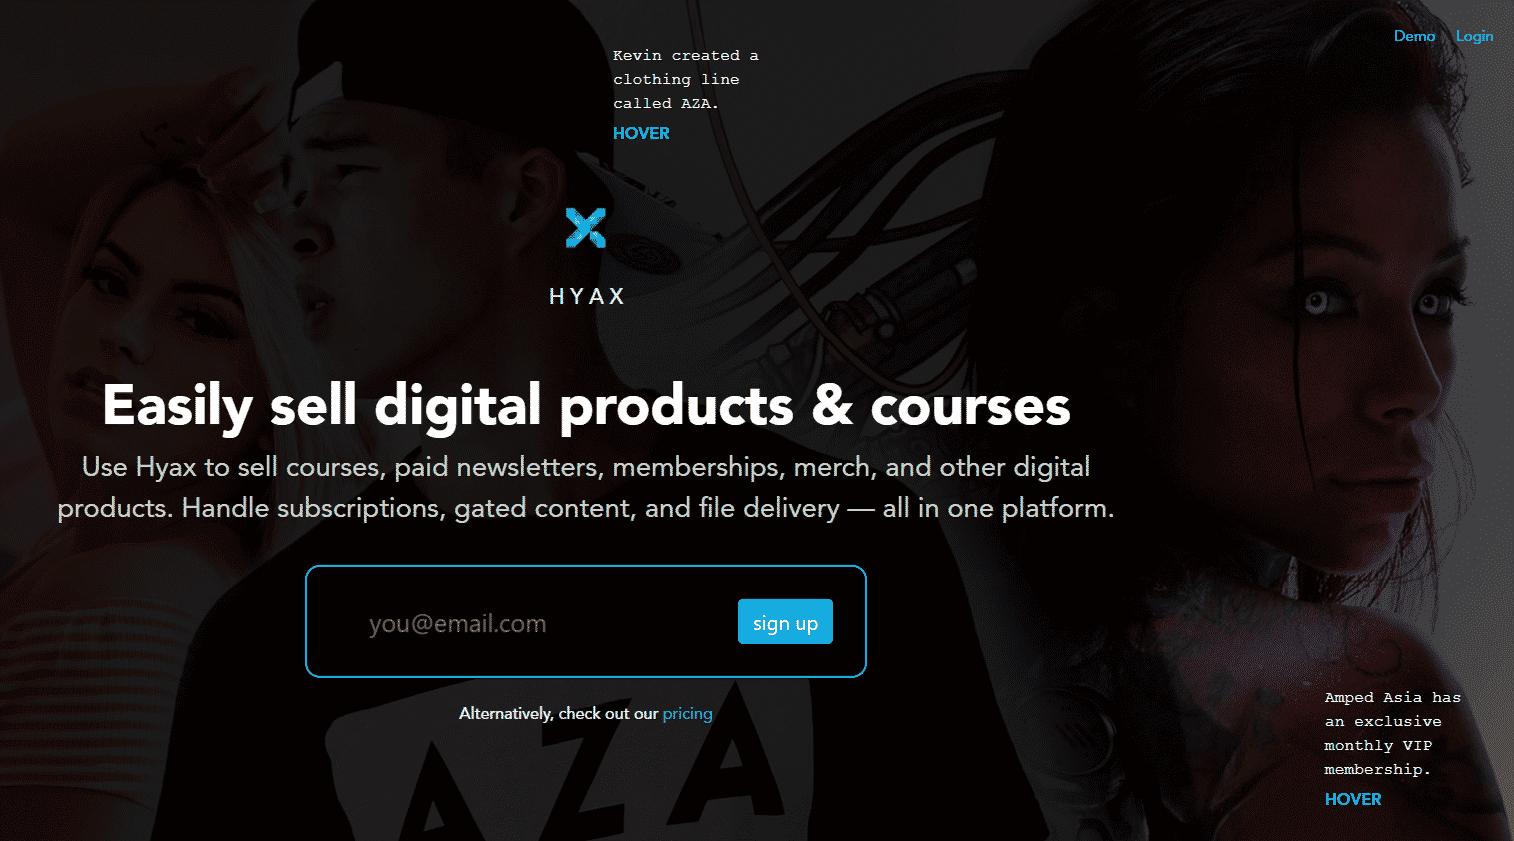 Hyax Sell Digital Products